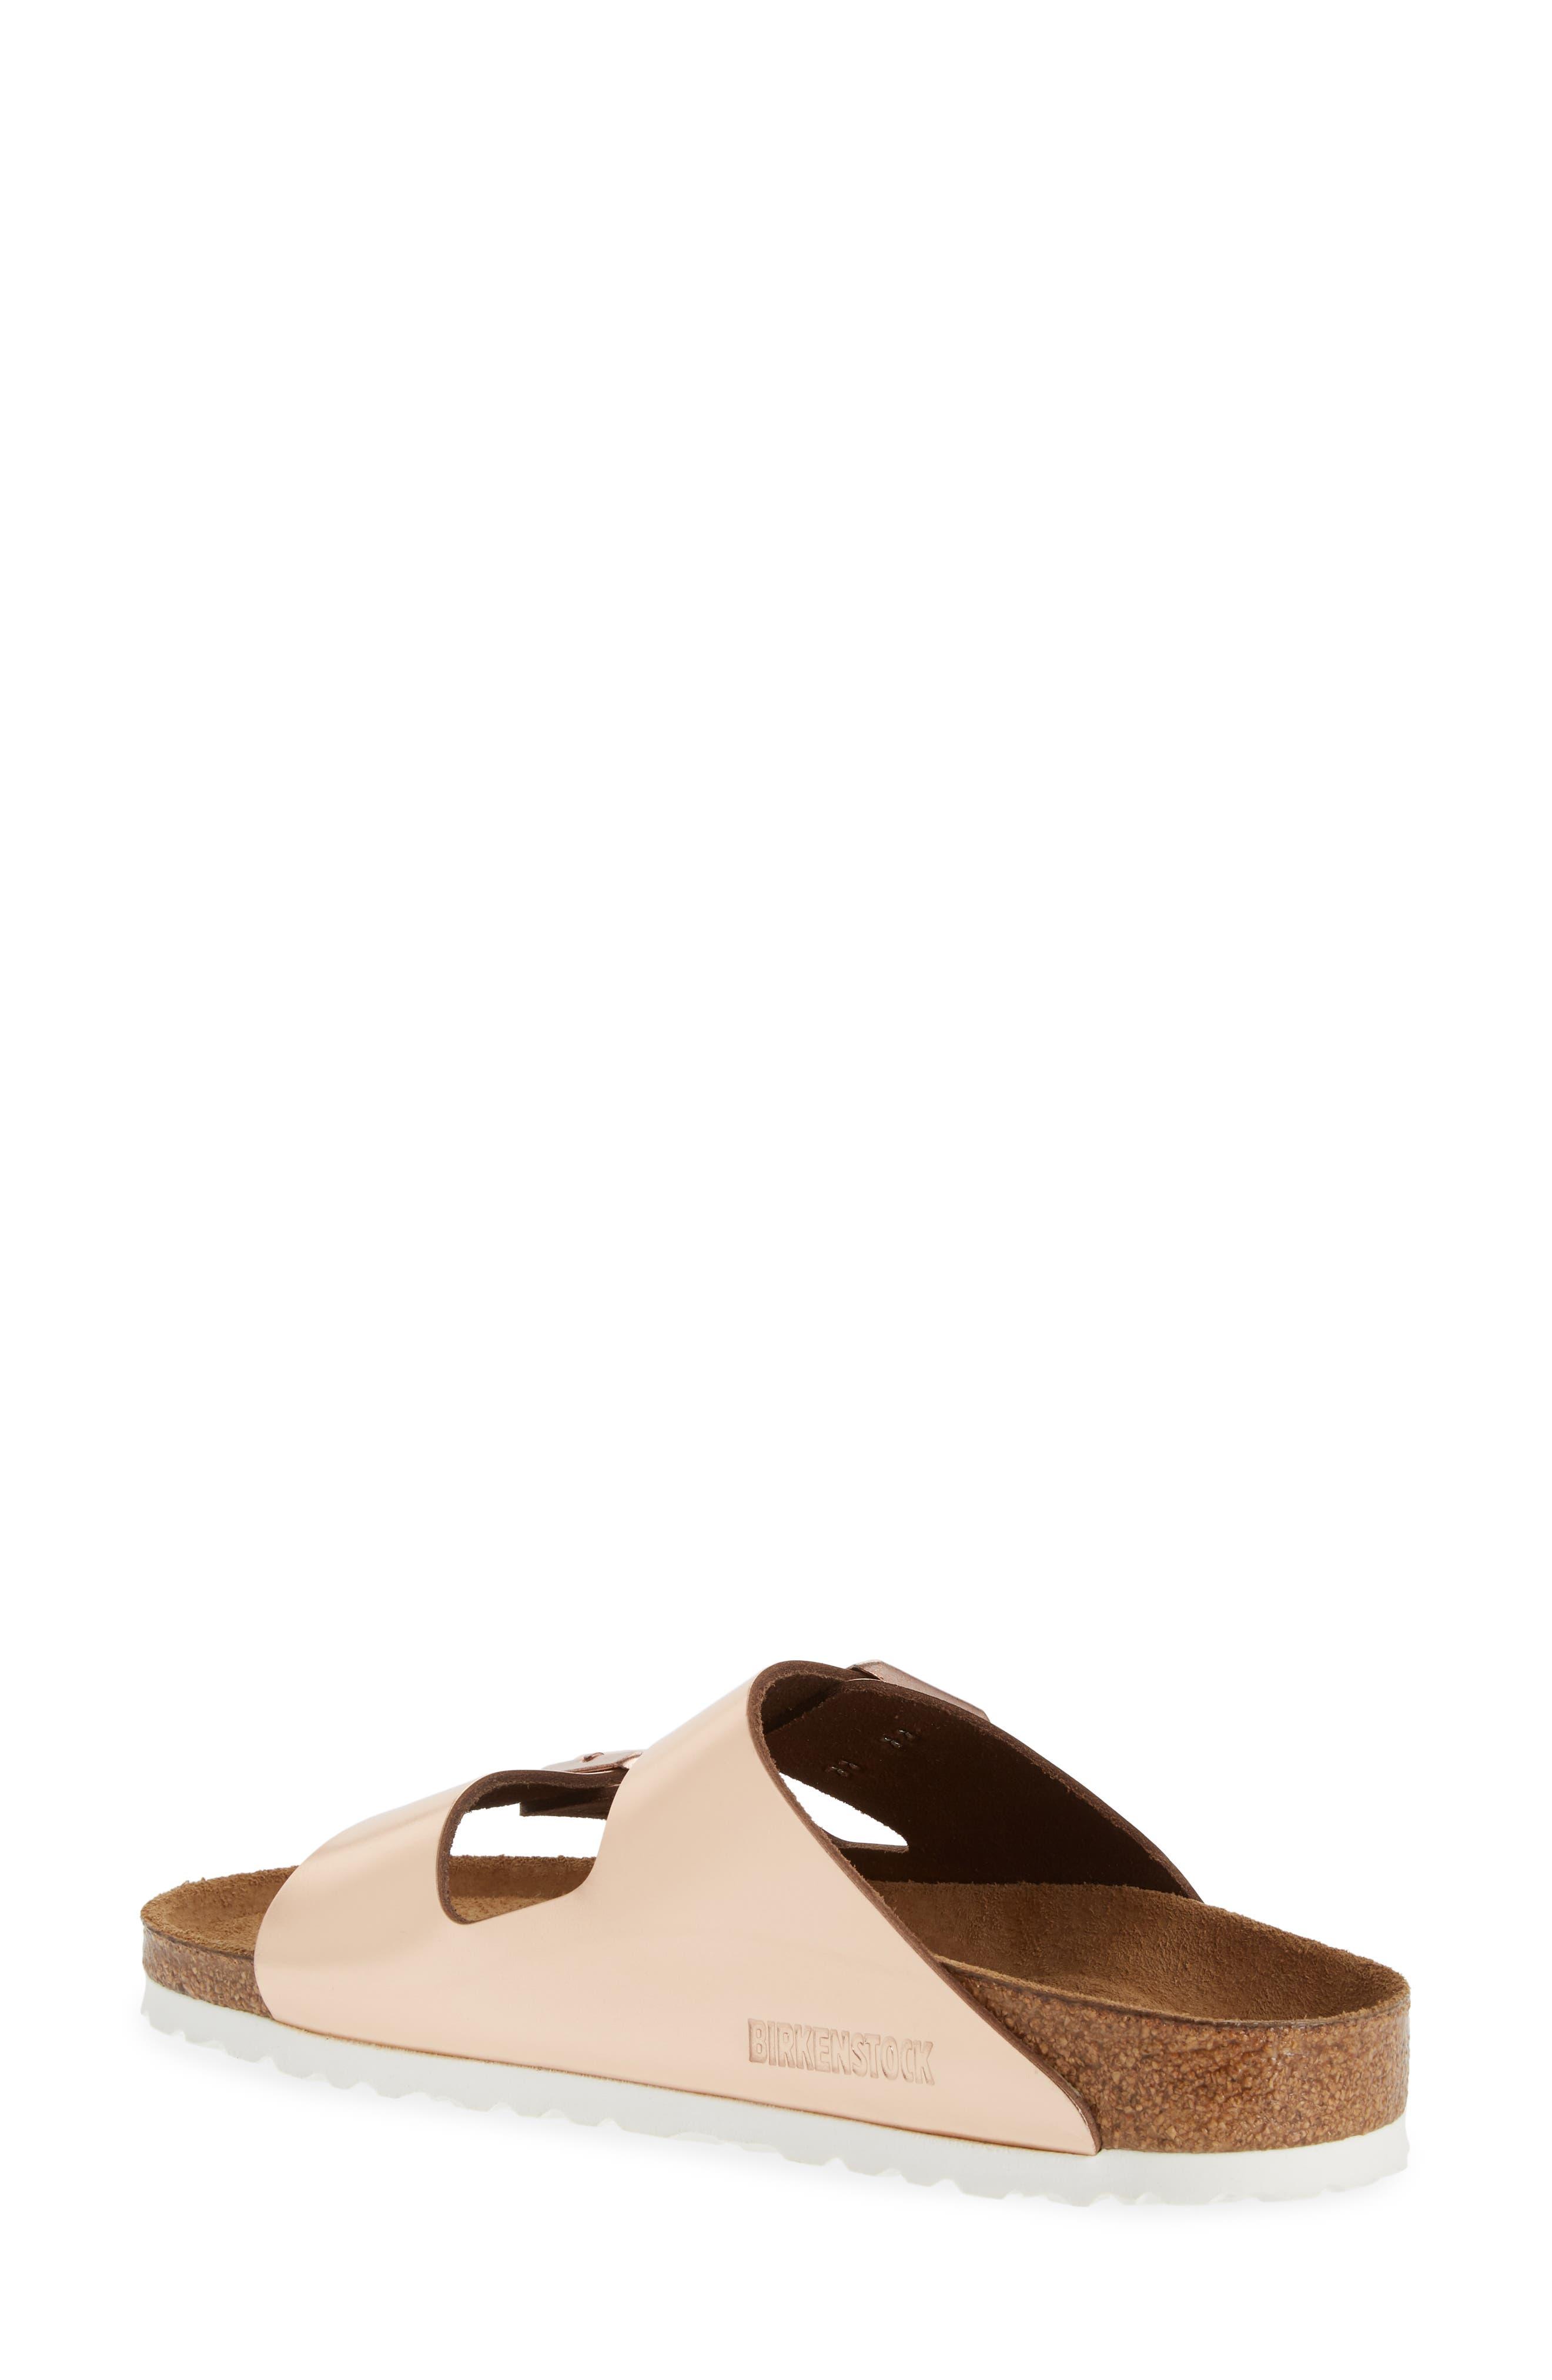 BIRKENSTOCK, 'Arizona' Soft Footbed Sandal, Alternate thumbnail 2, color, COPPER LEATHER